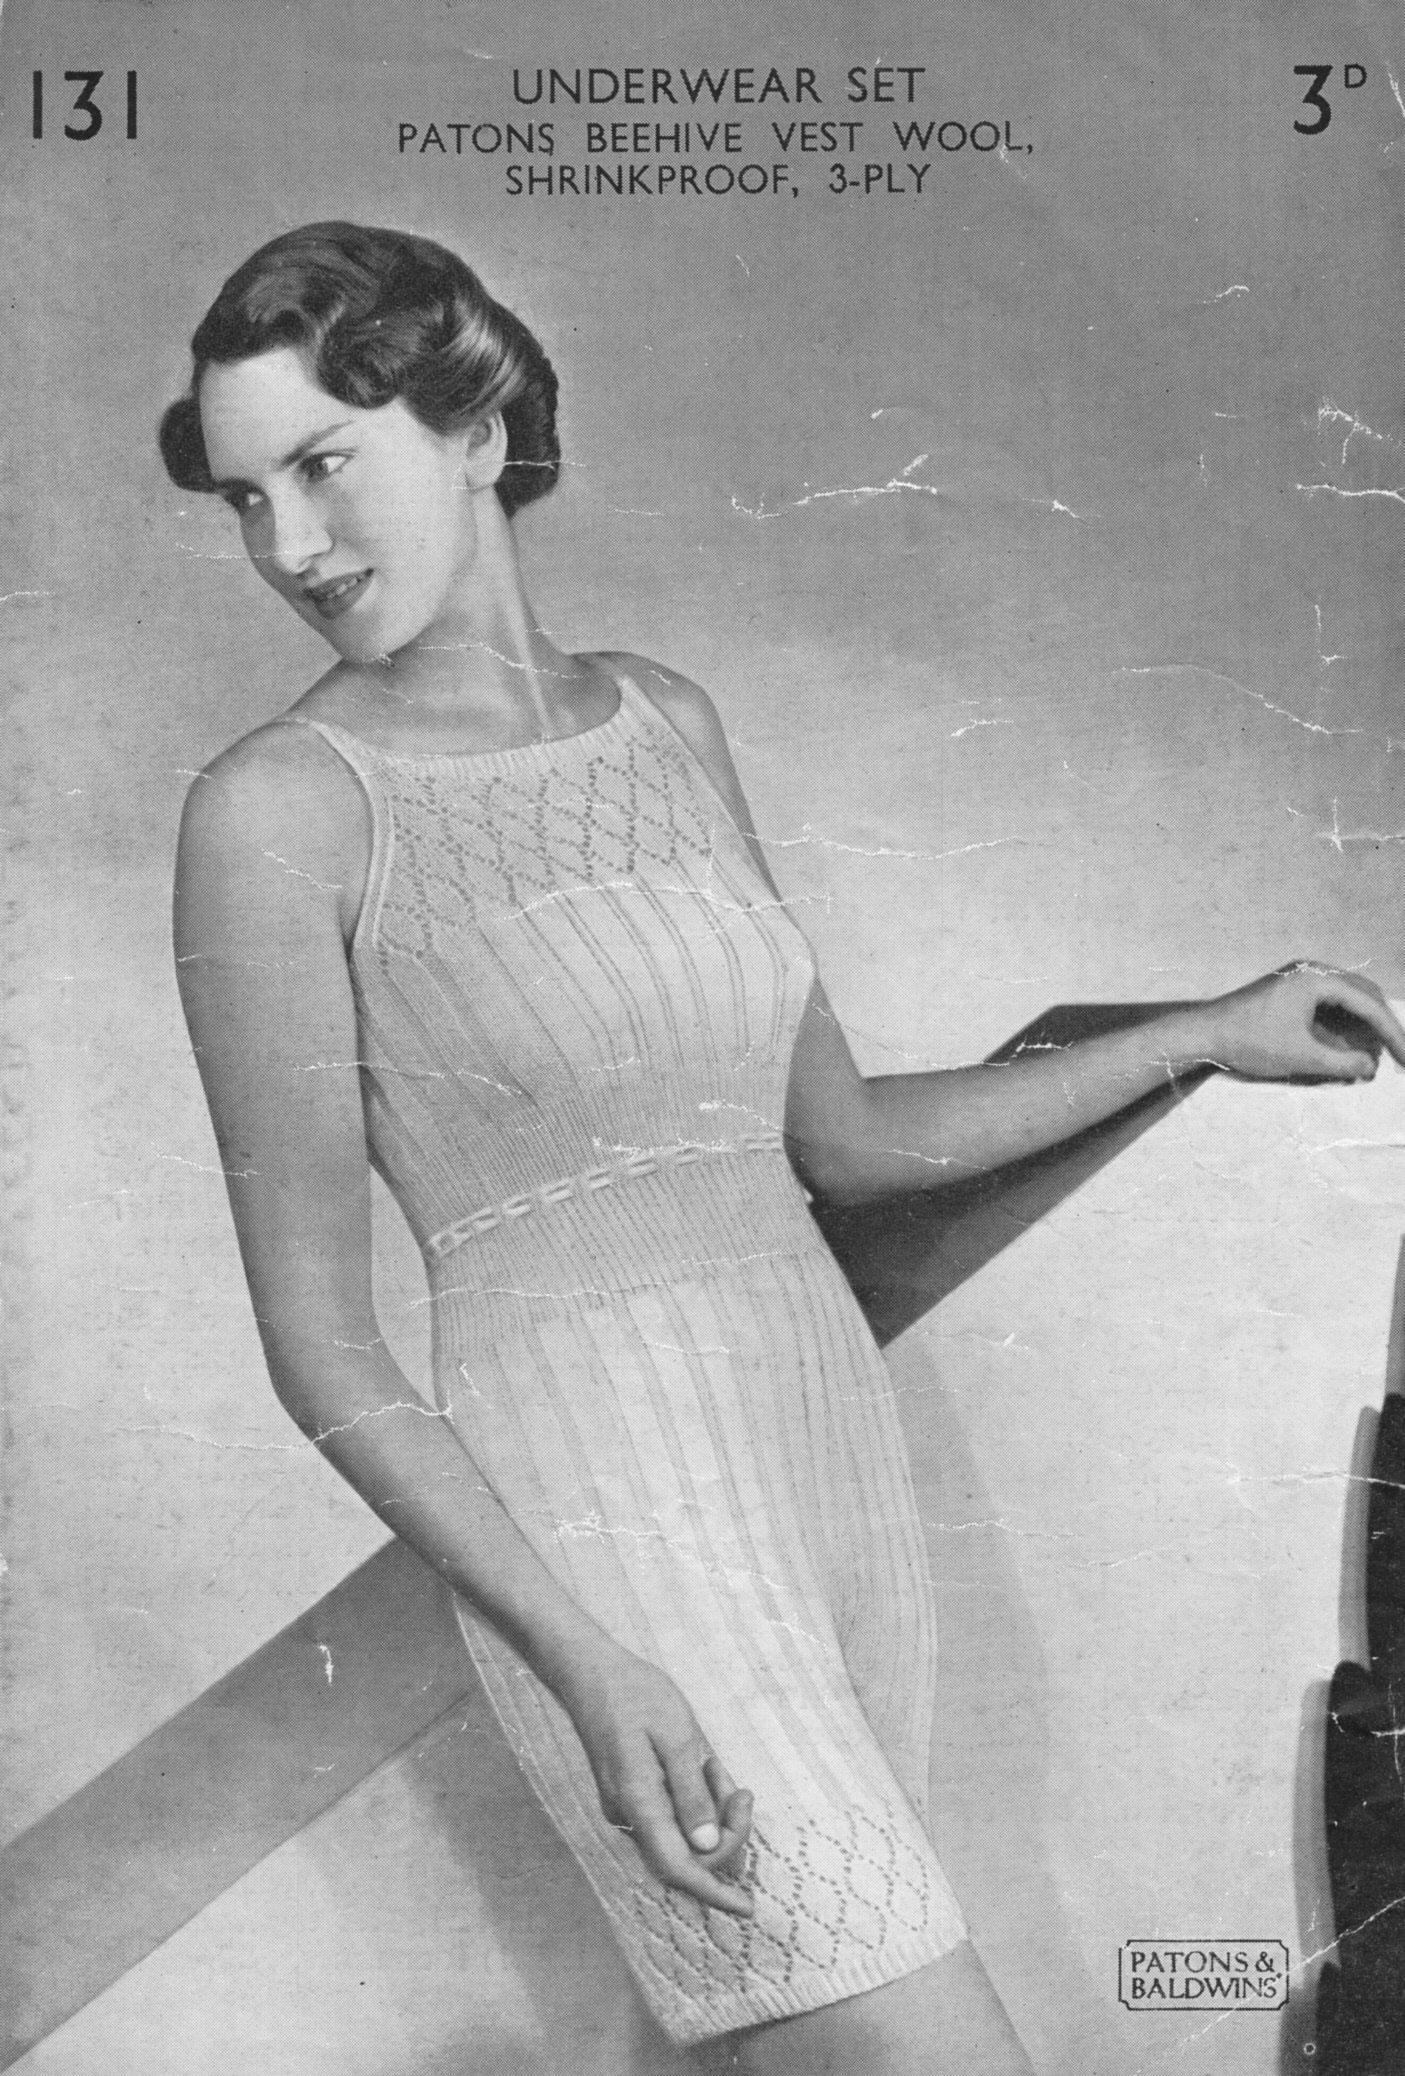 7fda4b1779 vintage patons 131 ladies underwear knitting pattern vest and knickers